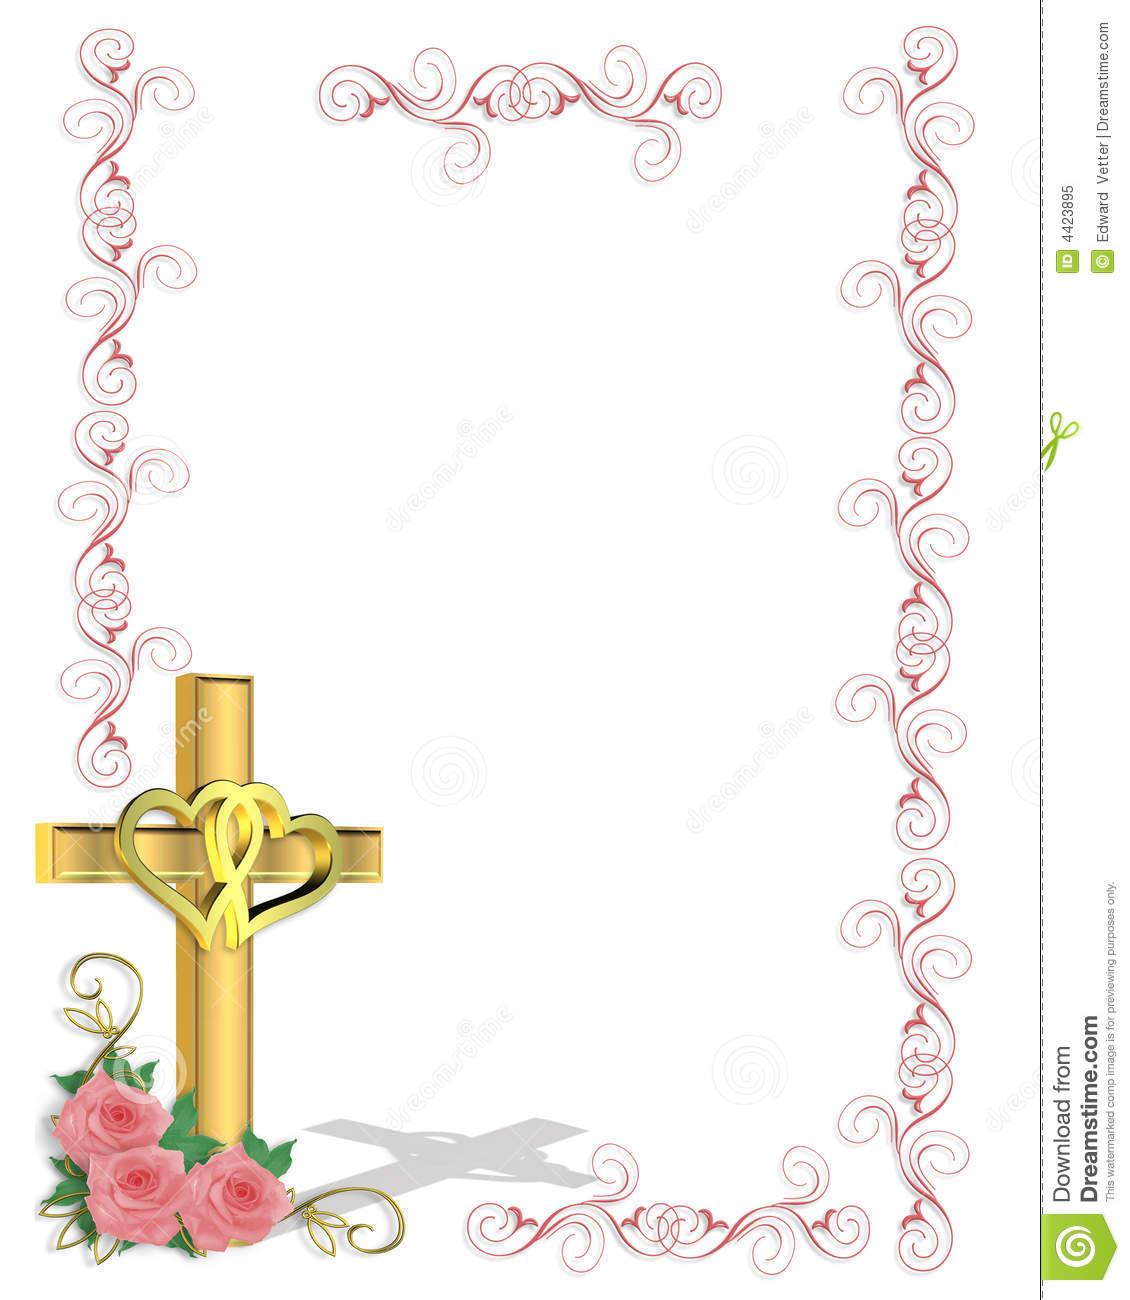 Free Wedding Invitation Clipart